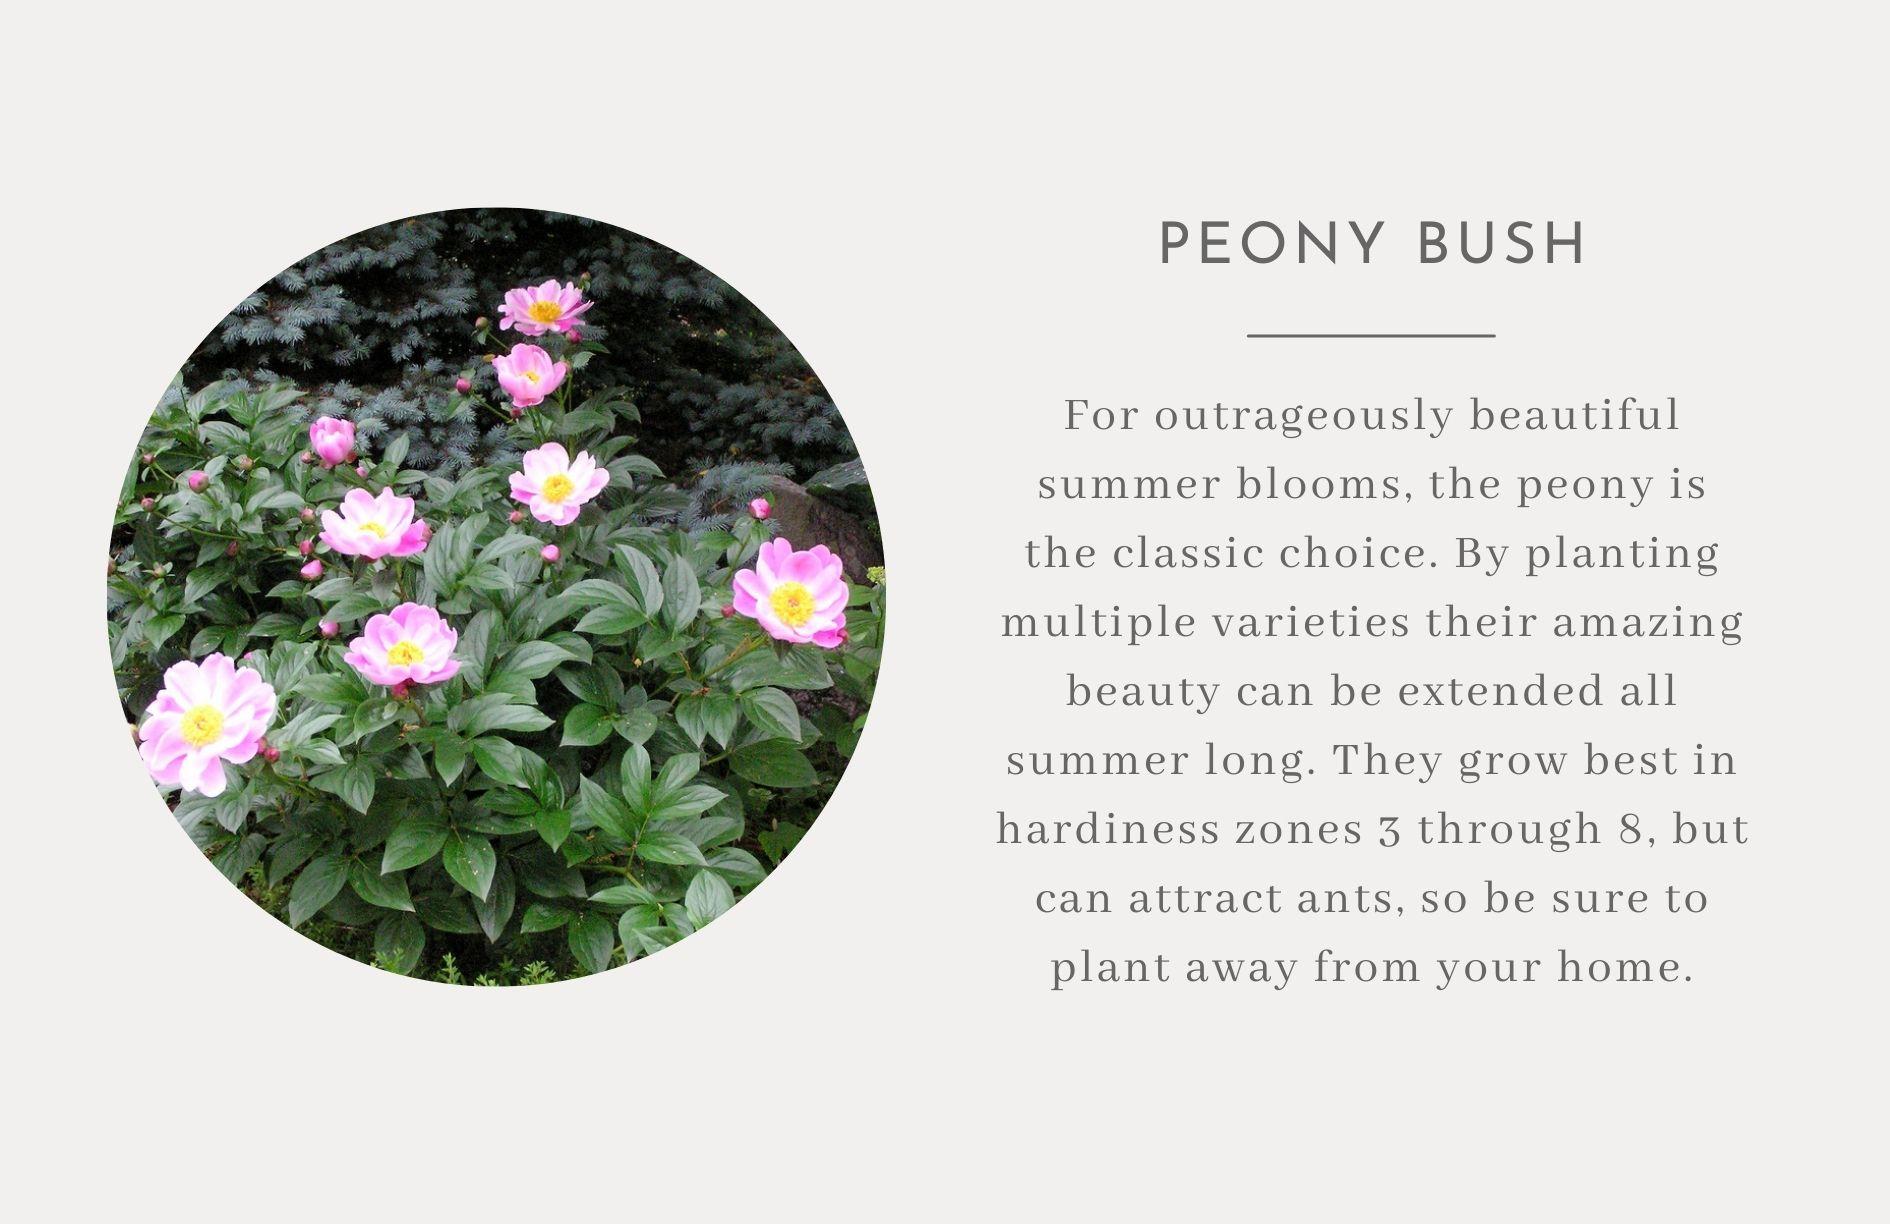 Peony bush